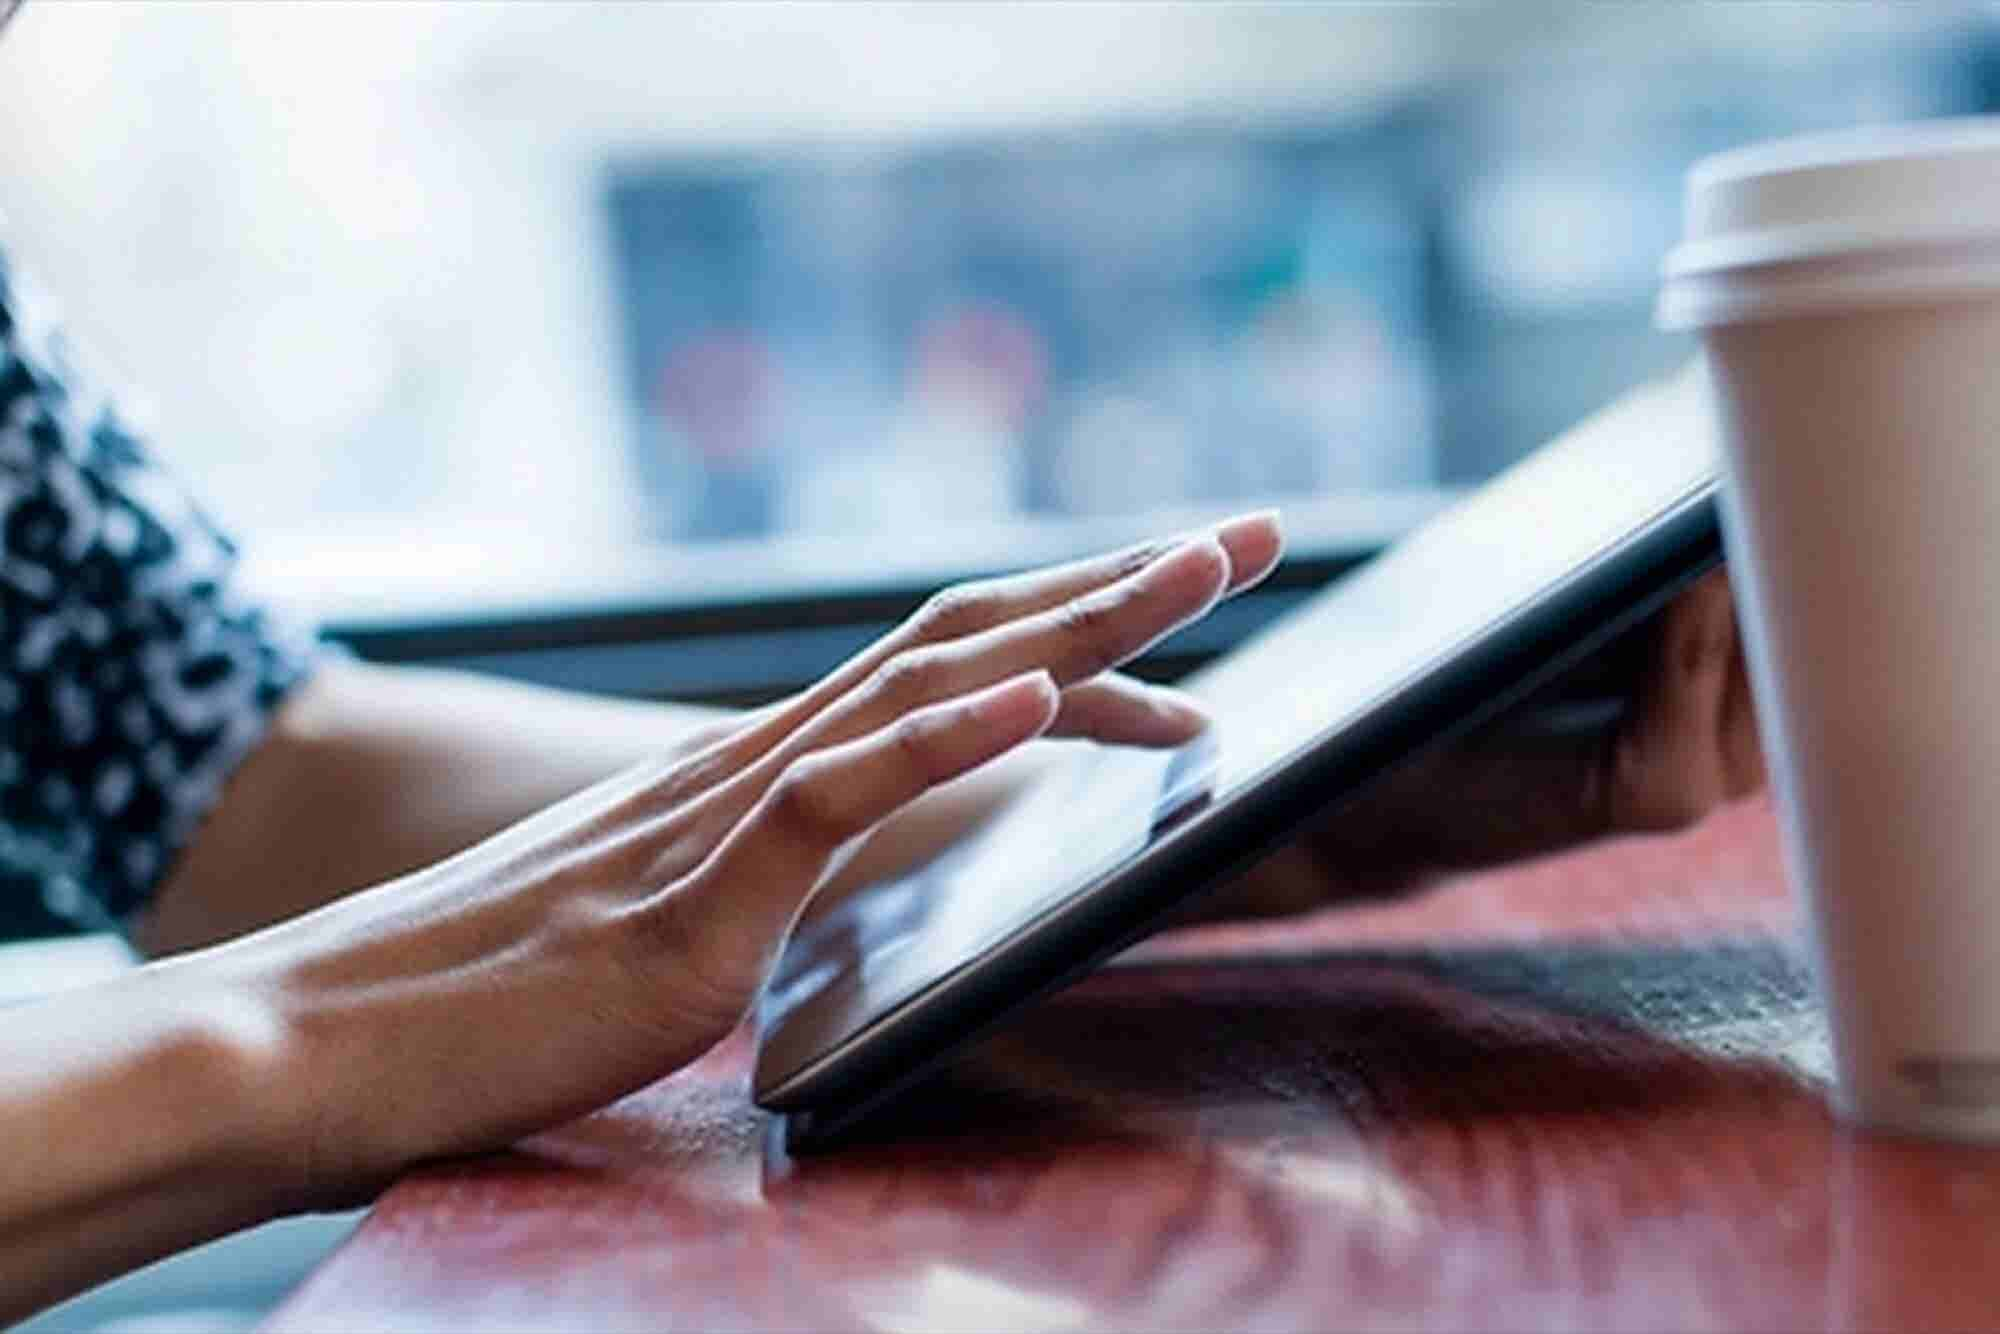 10 Proven Ways to Make Millions on Social Media